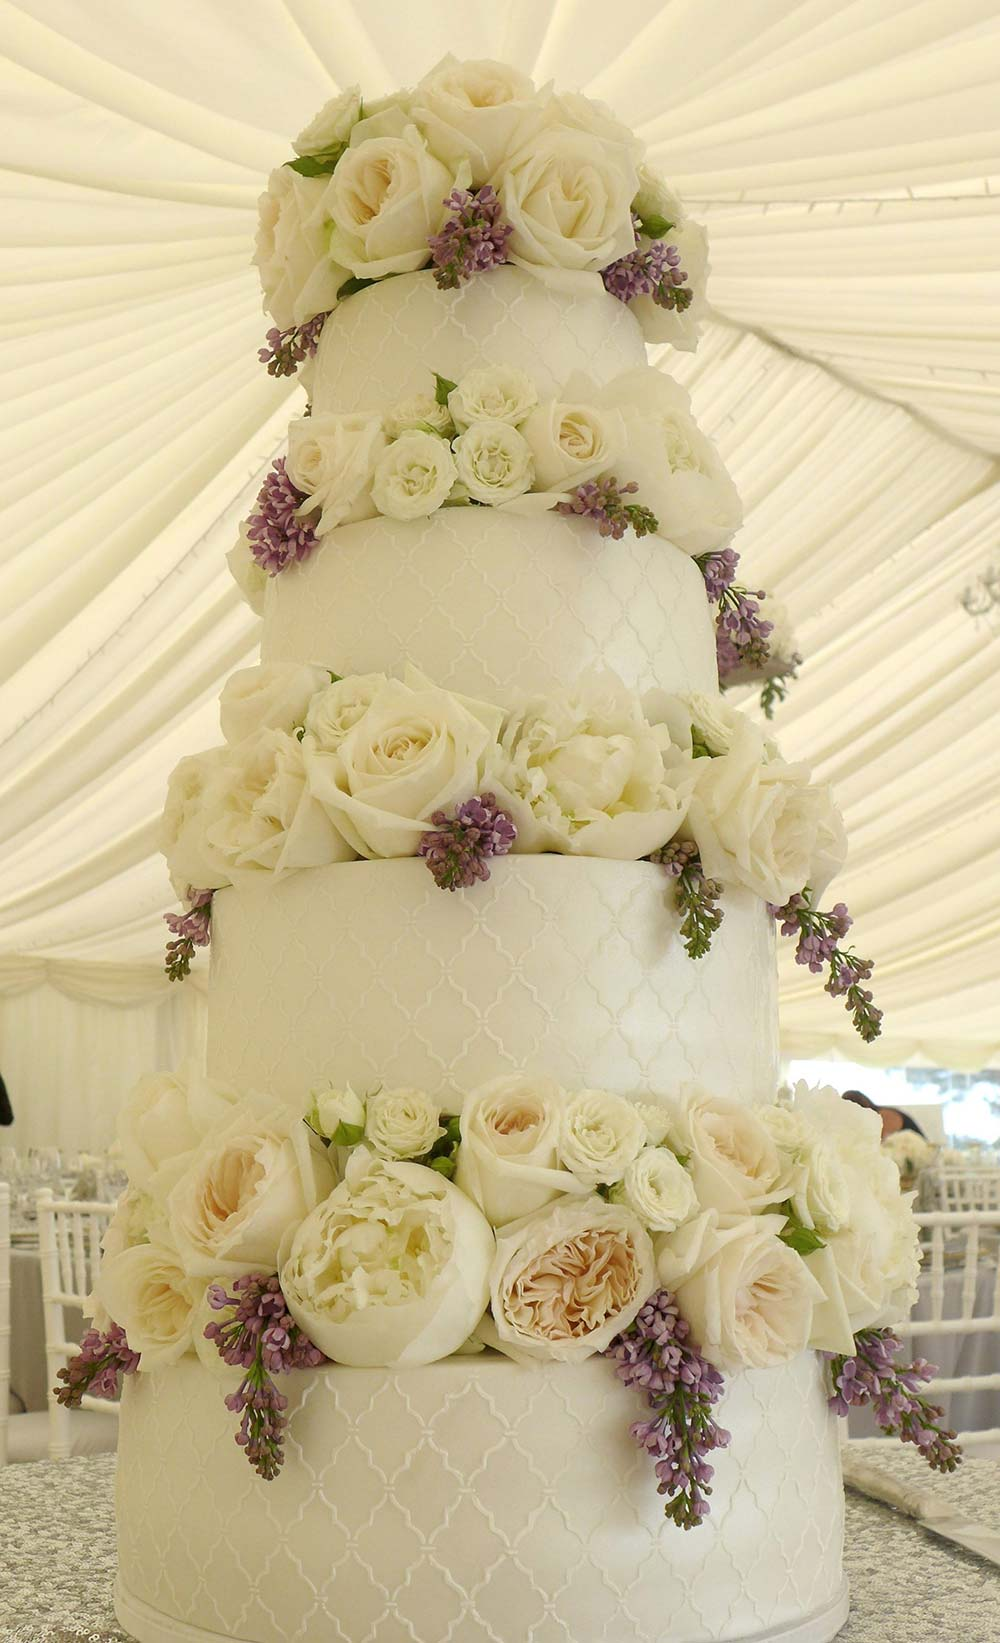 Cemyln cakes - wedding cakes Bristol